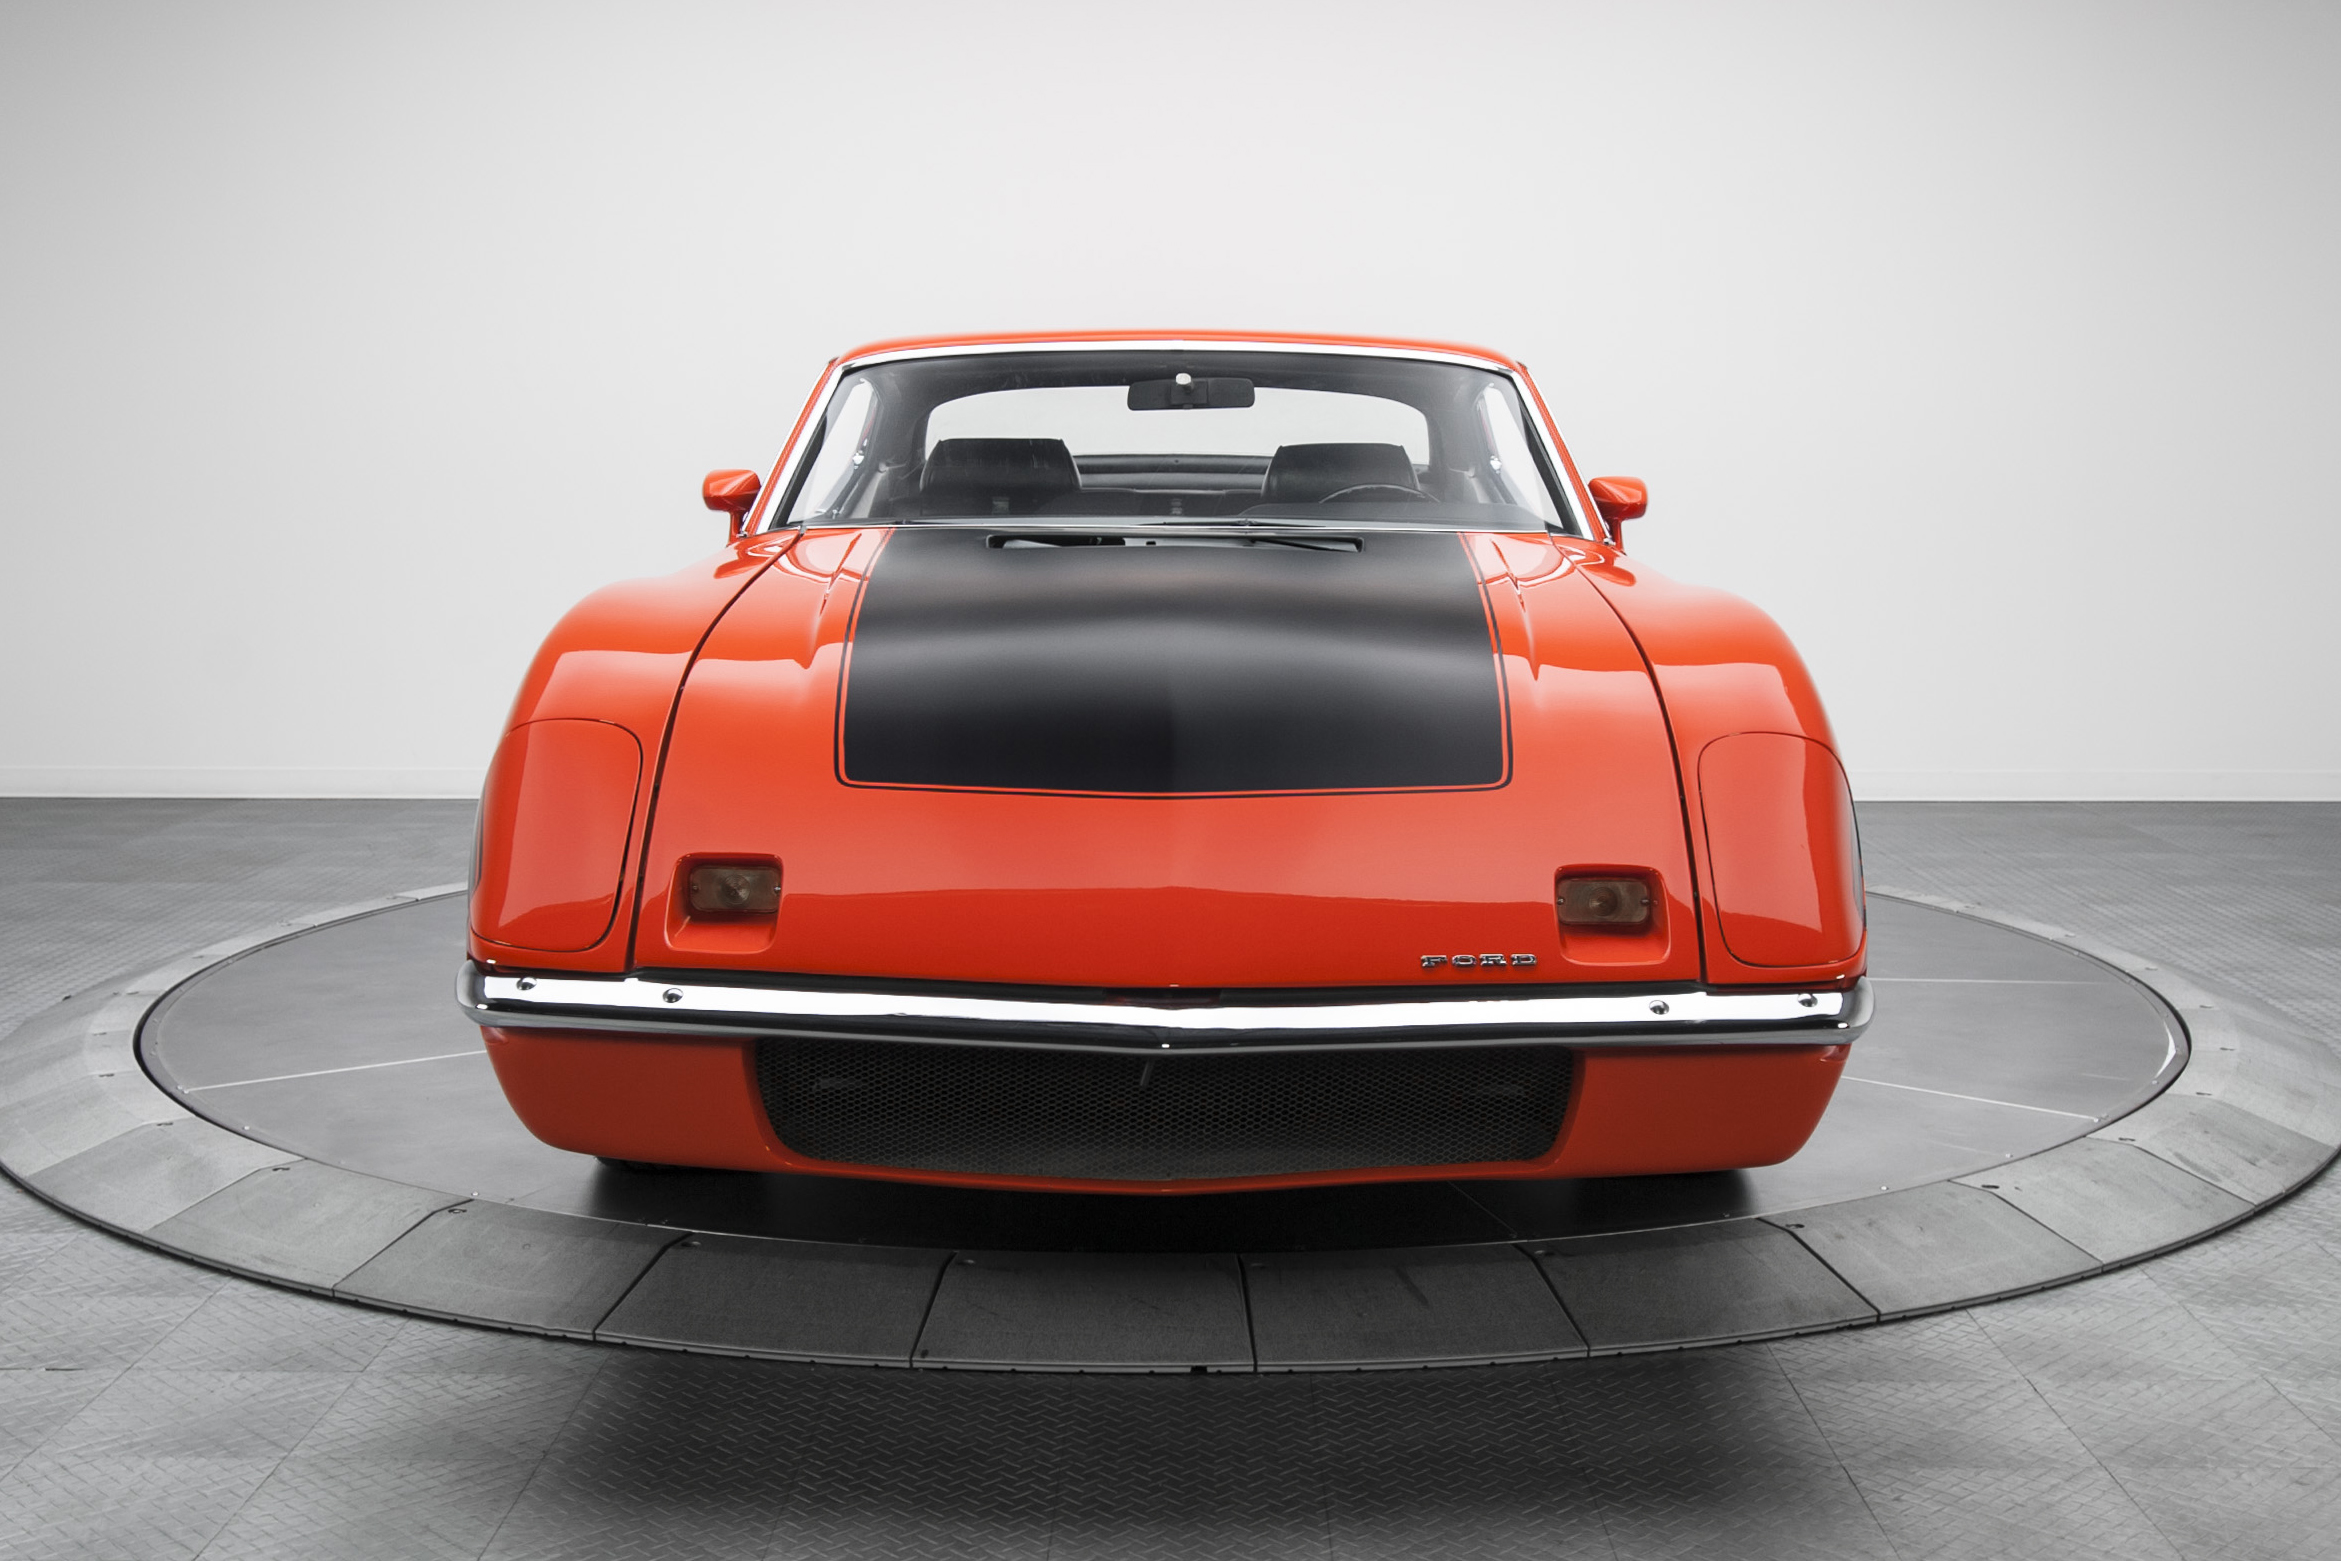 Ford Torino King Cobra front